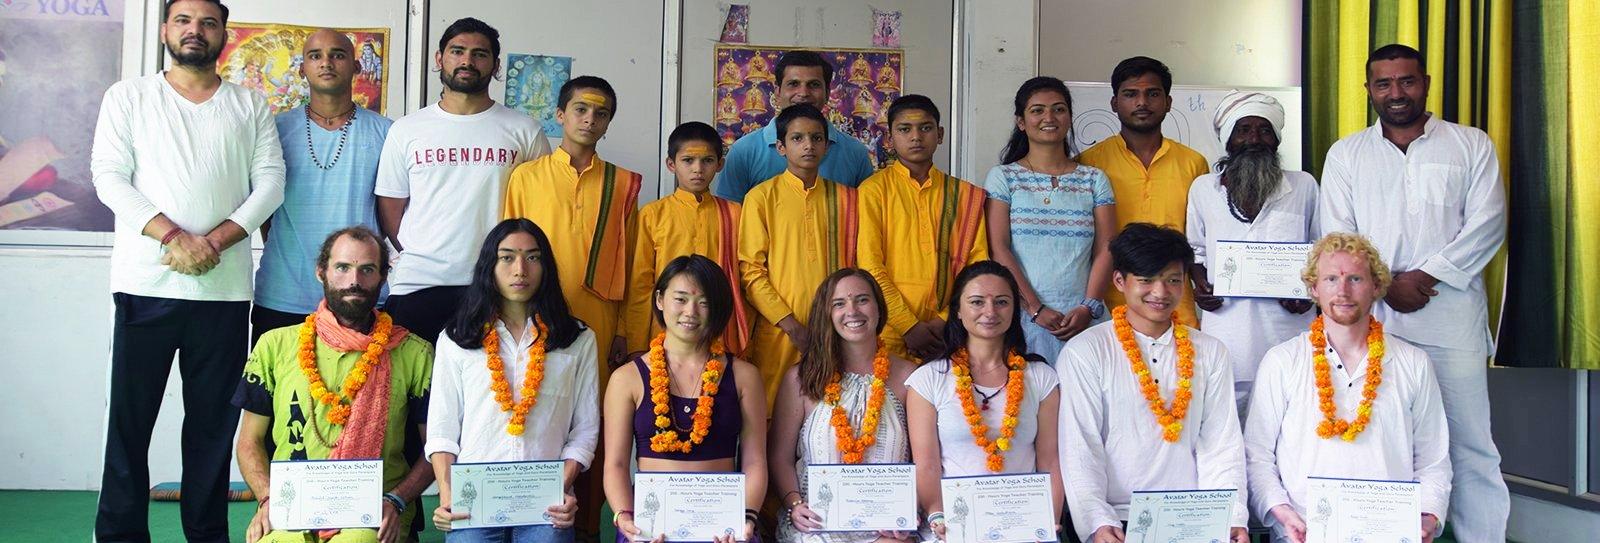 rishikesh-yoga-teacher-training-course-india